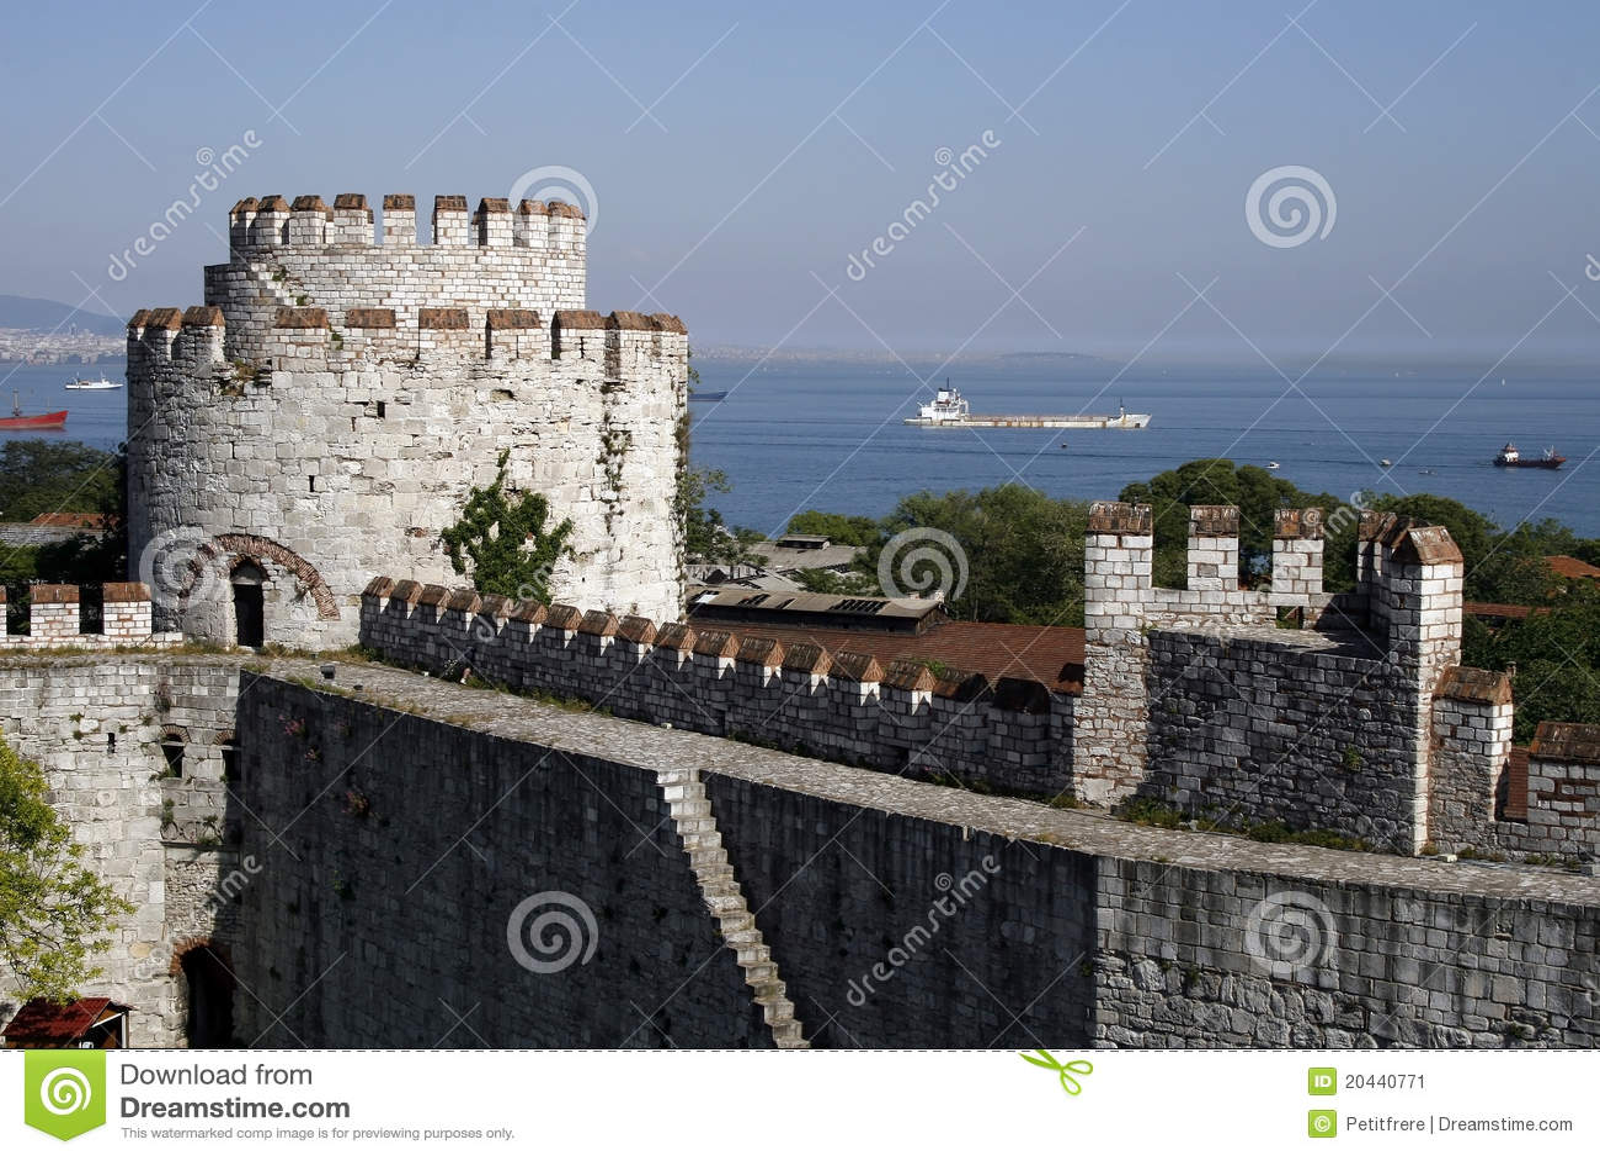 Yedikule Castle Editorial Photo - Image: 20440771